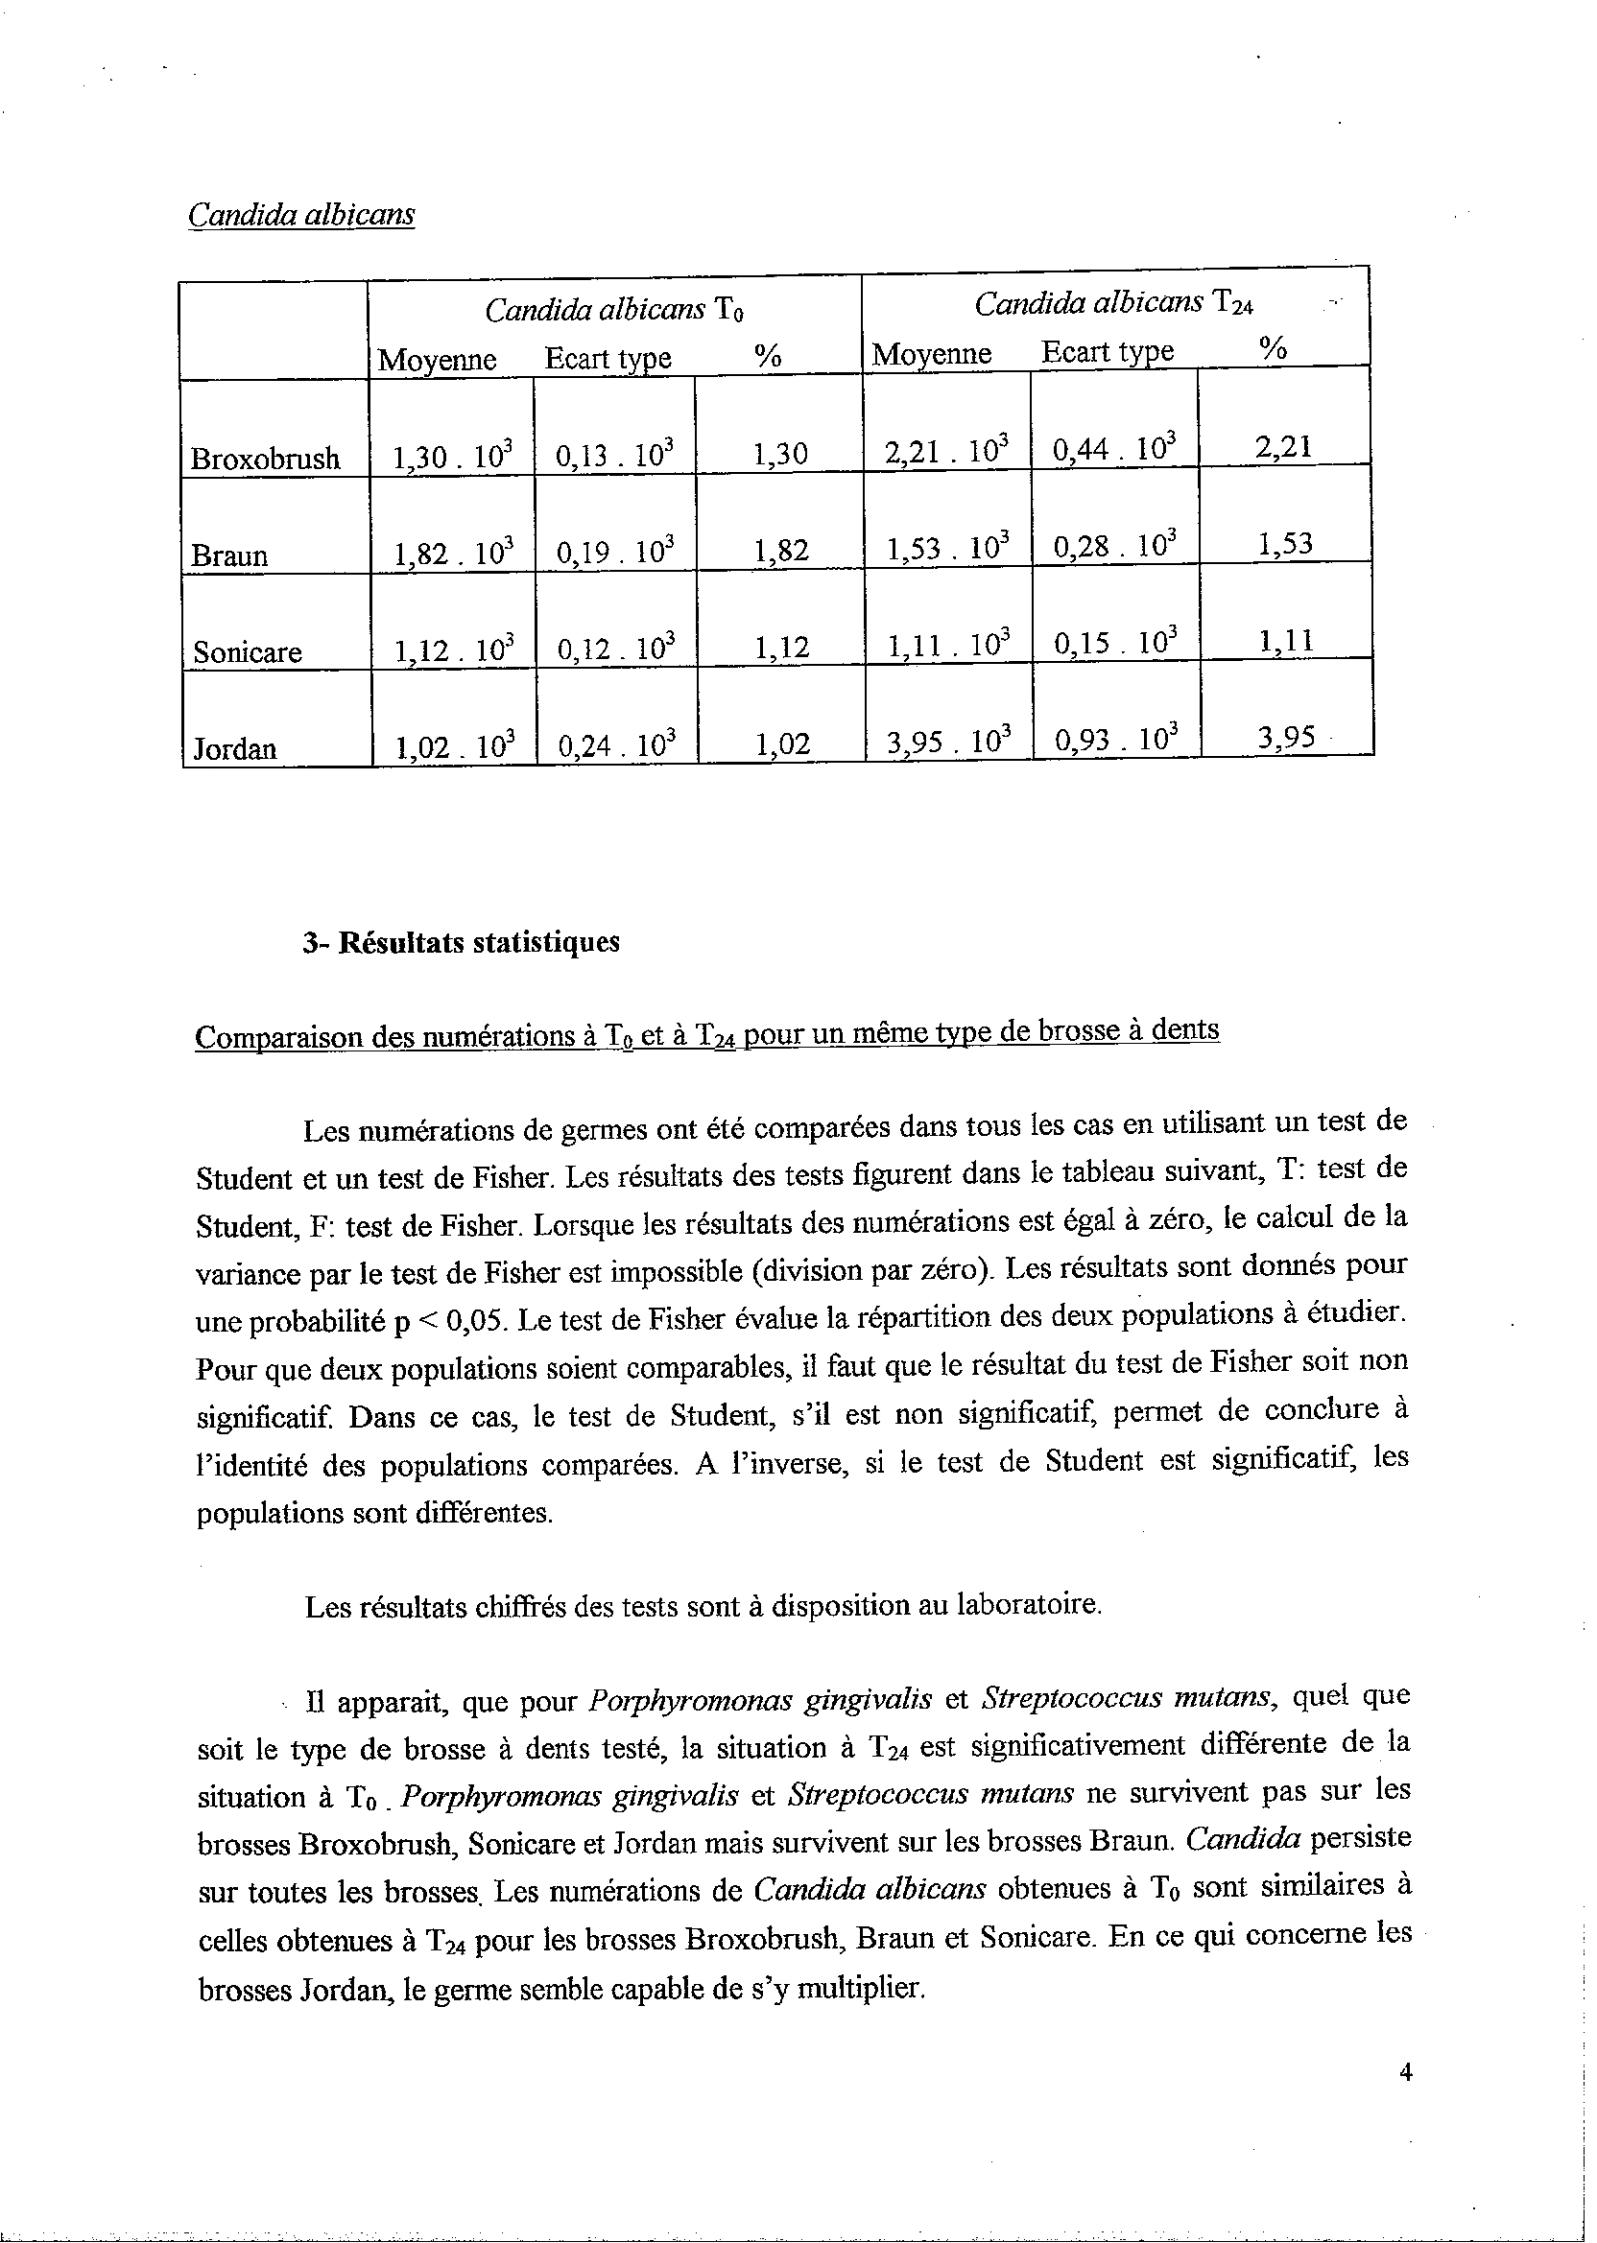 Etude6-page5